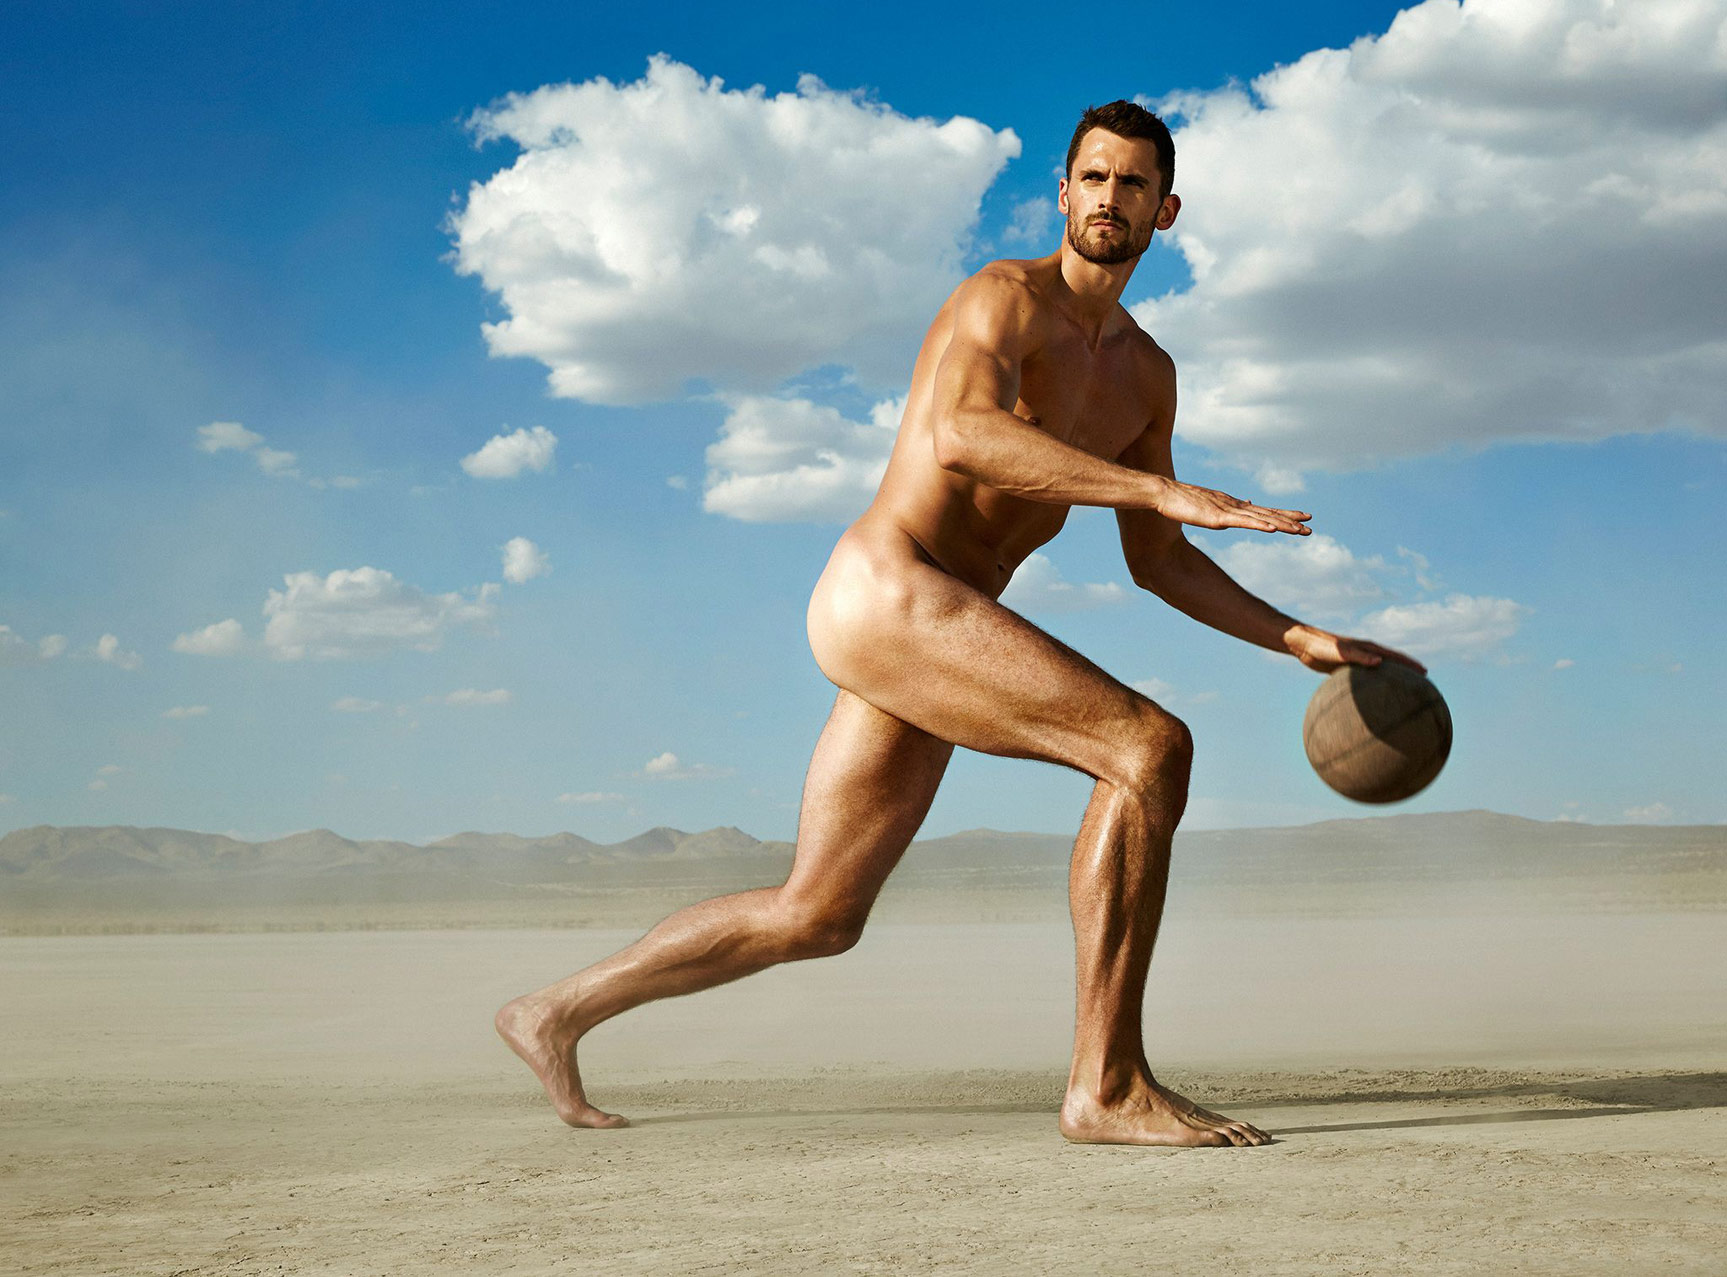 ESPN Magazine The Body Issue 2015 - Kevin Love / Кевин Лав - Культ тела журнала ESPN